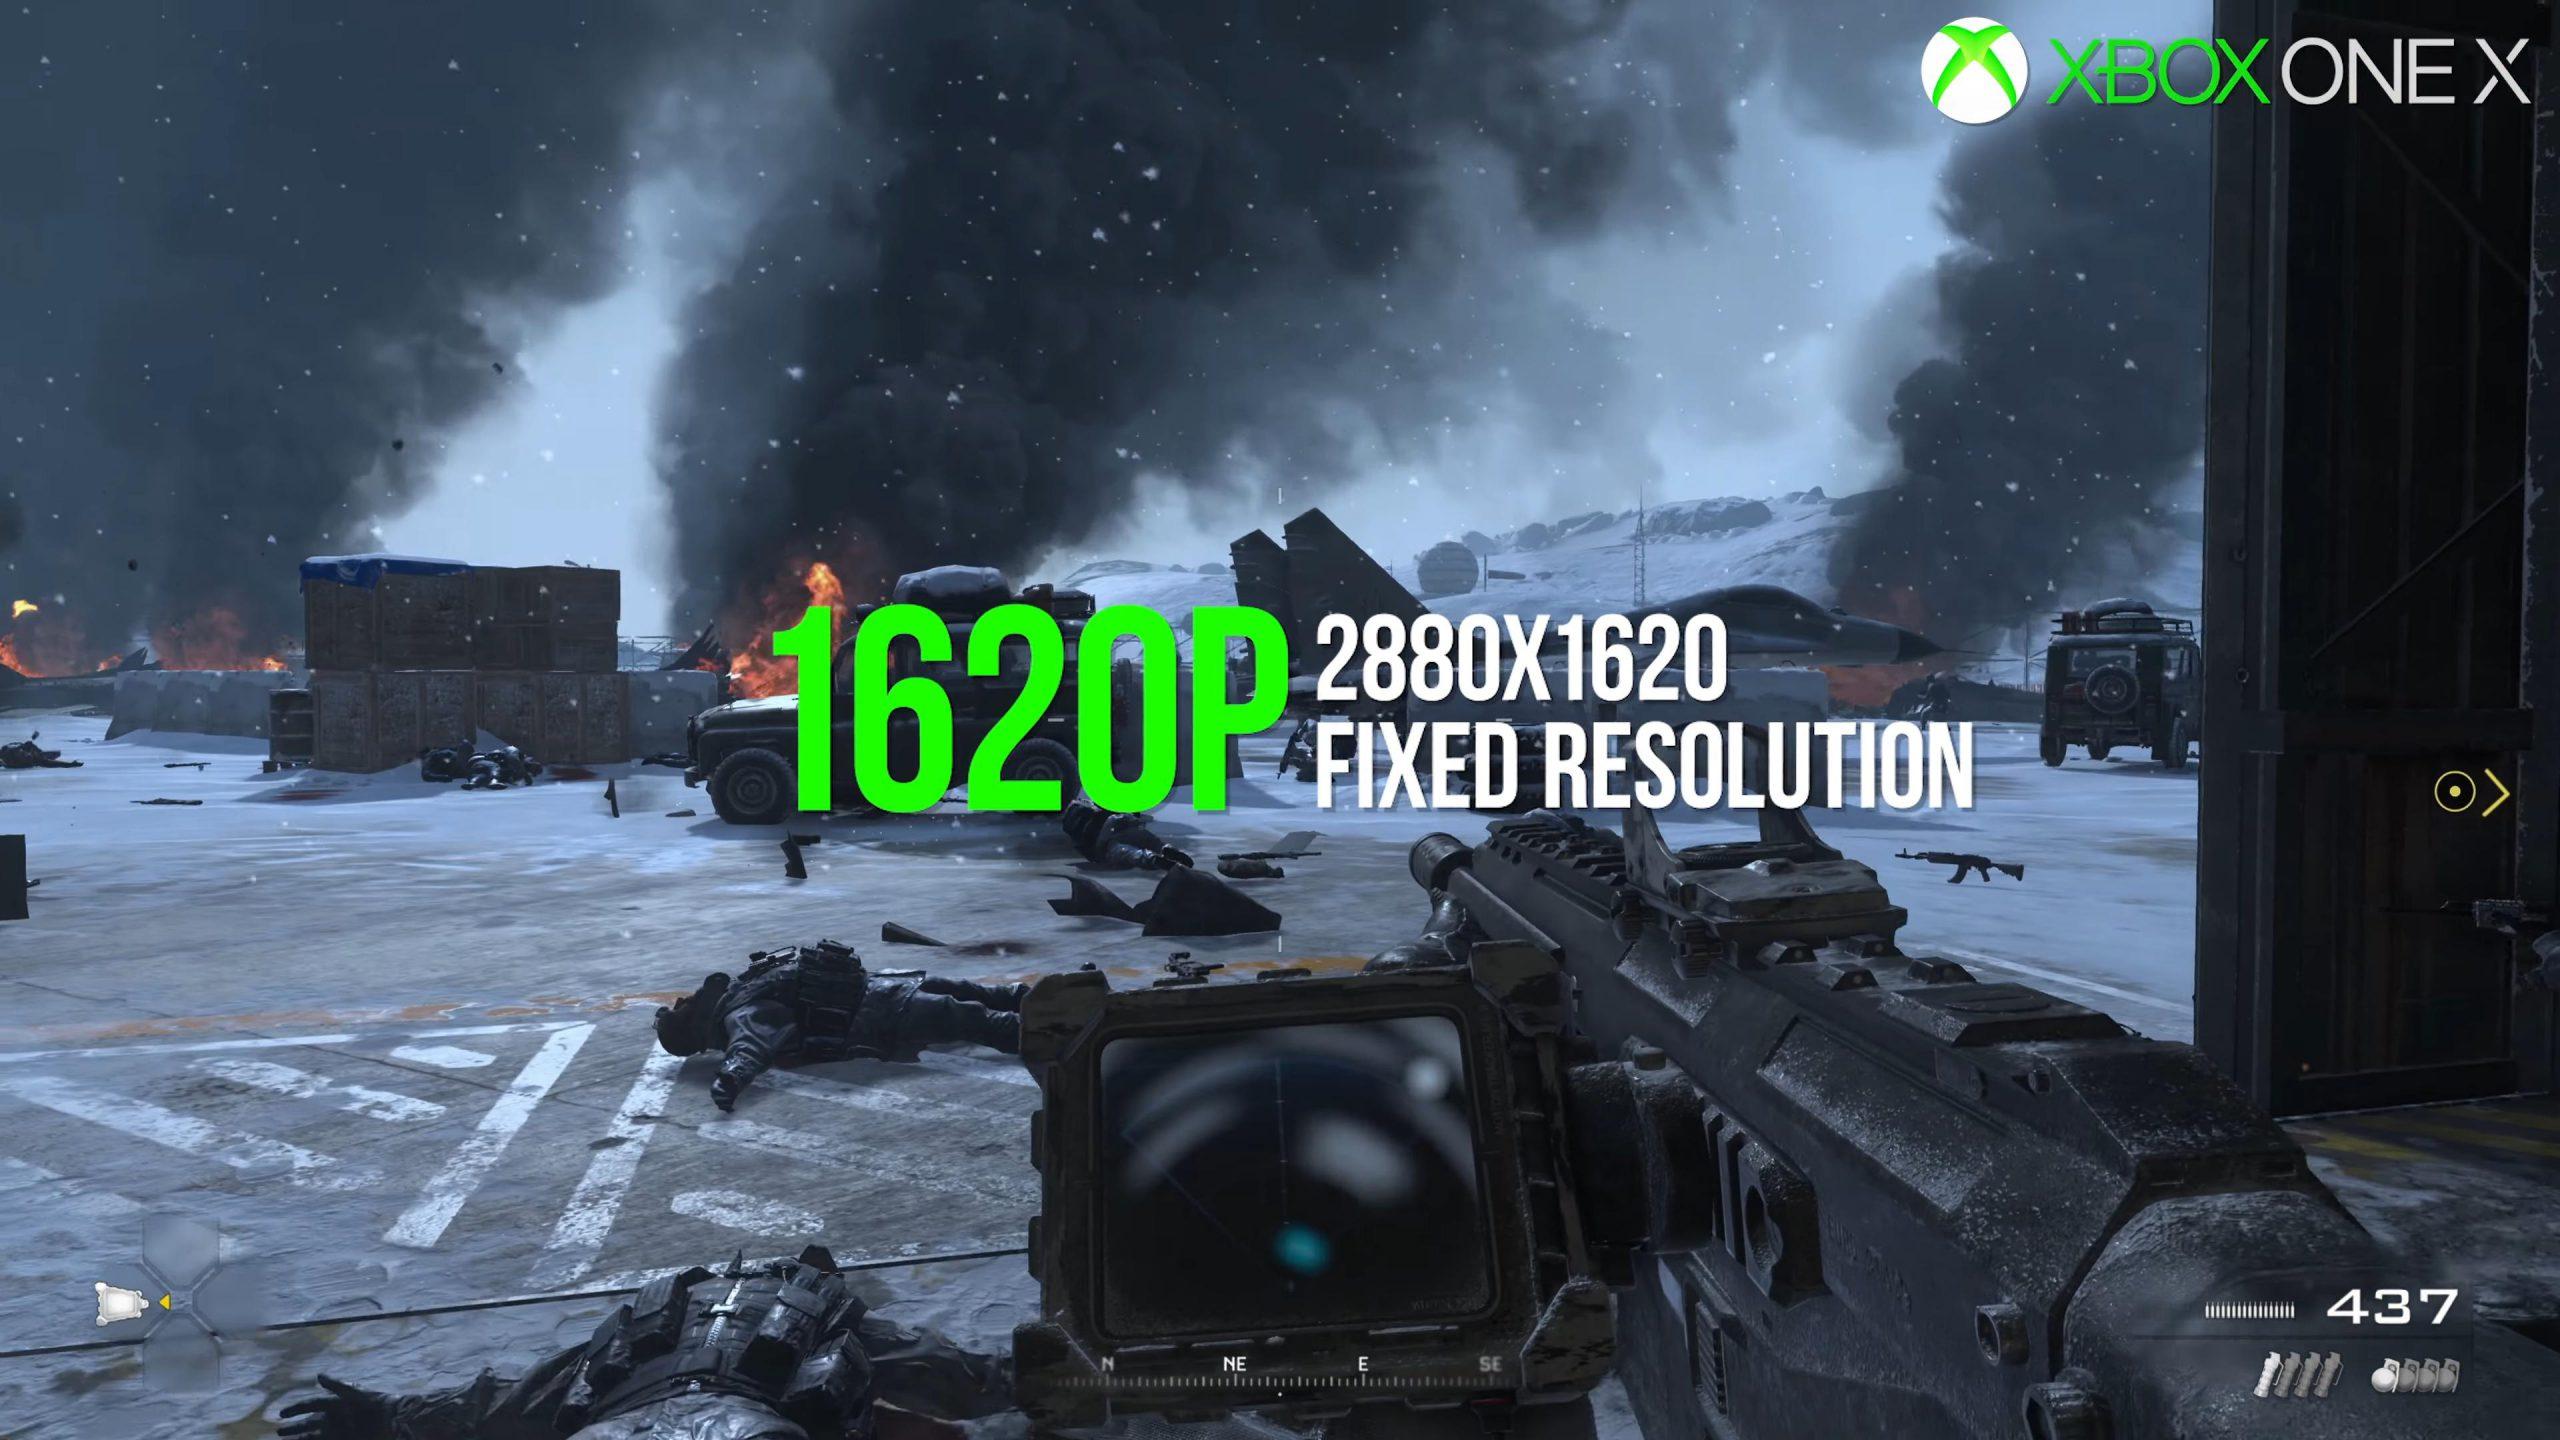 1A2F4vk 1 scaled - 「CoD:MW2リマスター」Xbox One X版をPS4 Proと全く同じグラフィックにしてしまい、メディアから酷評